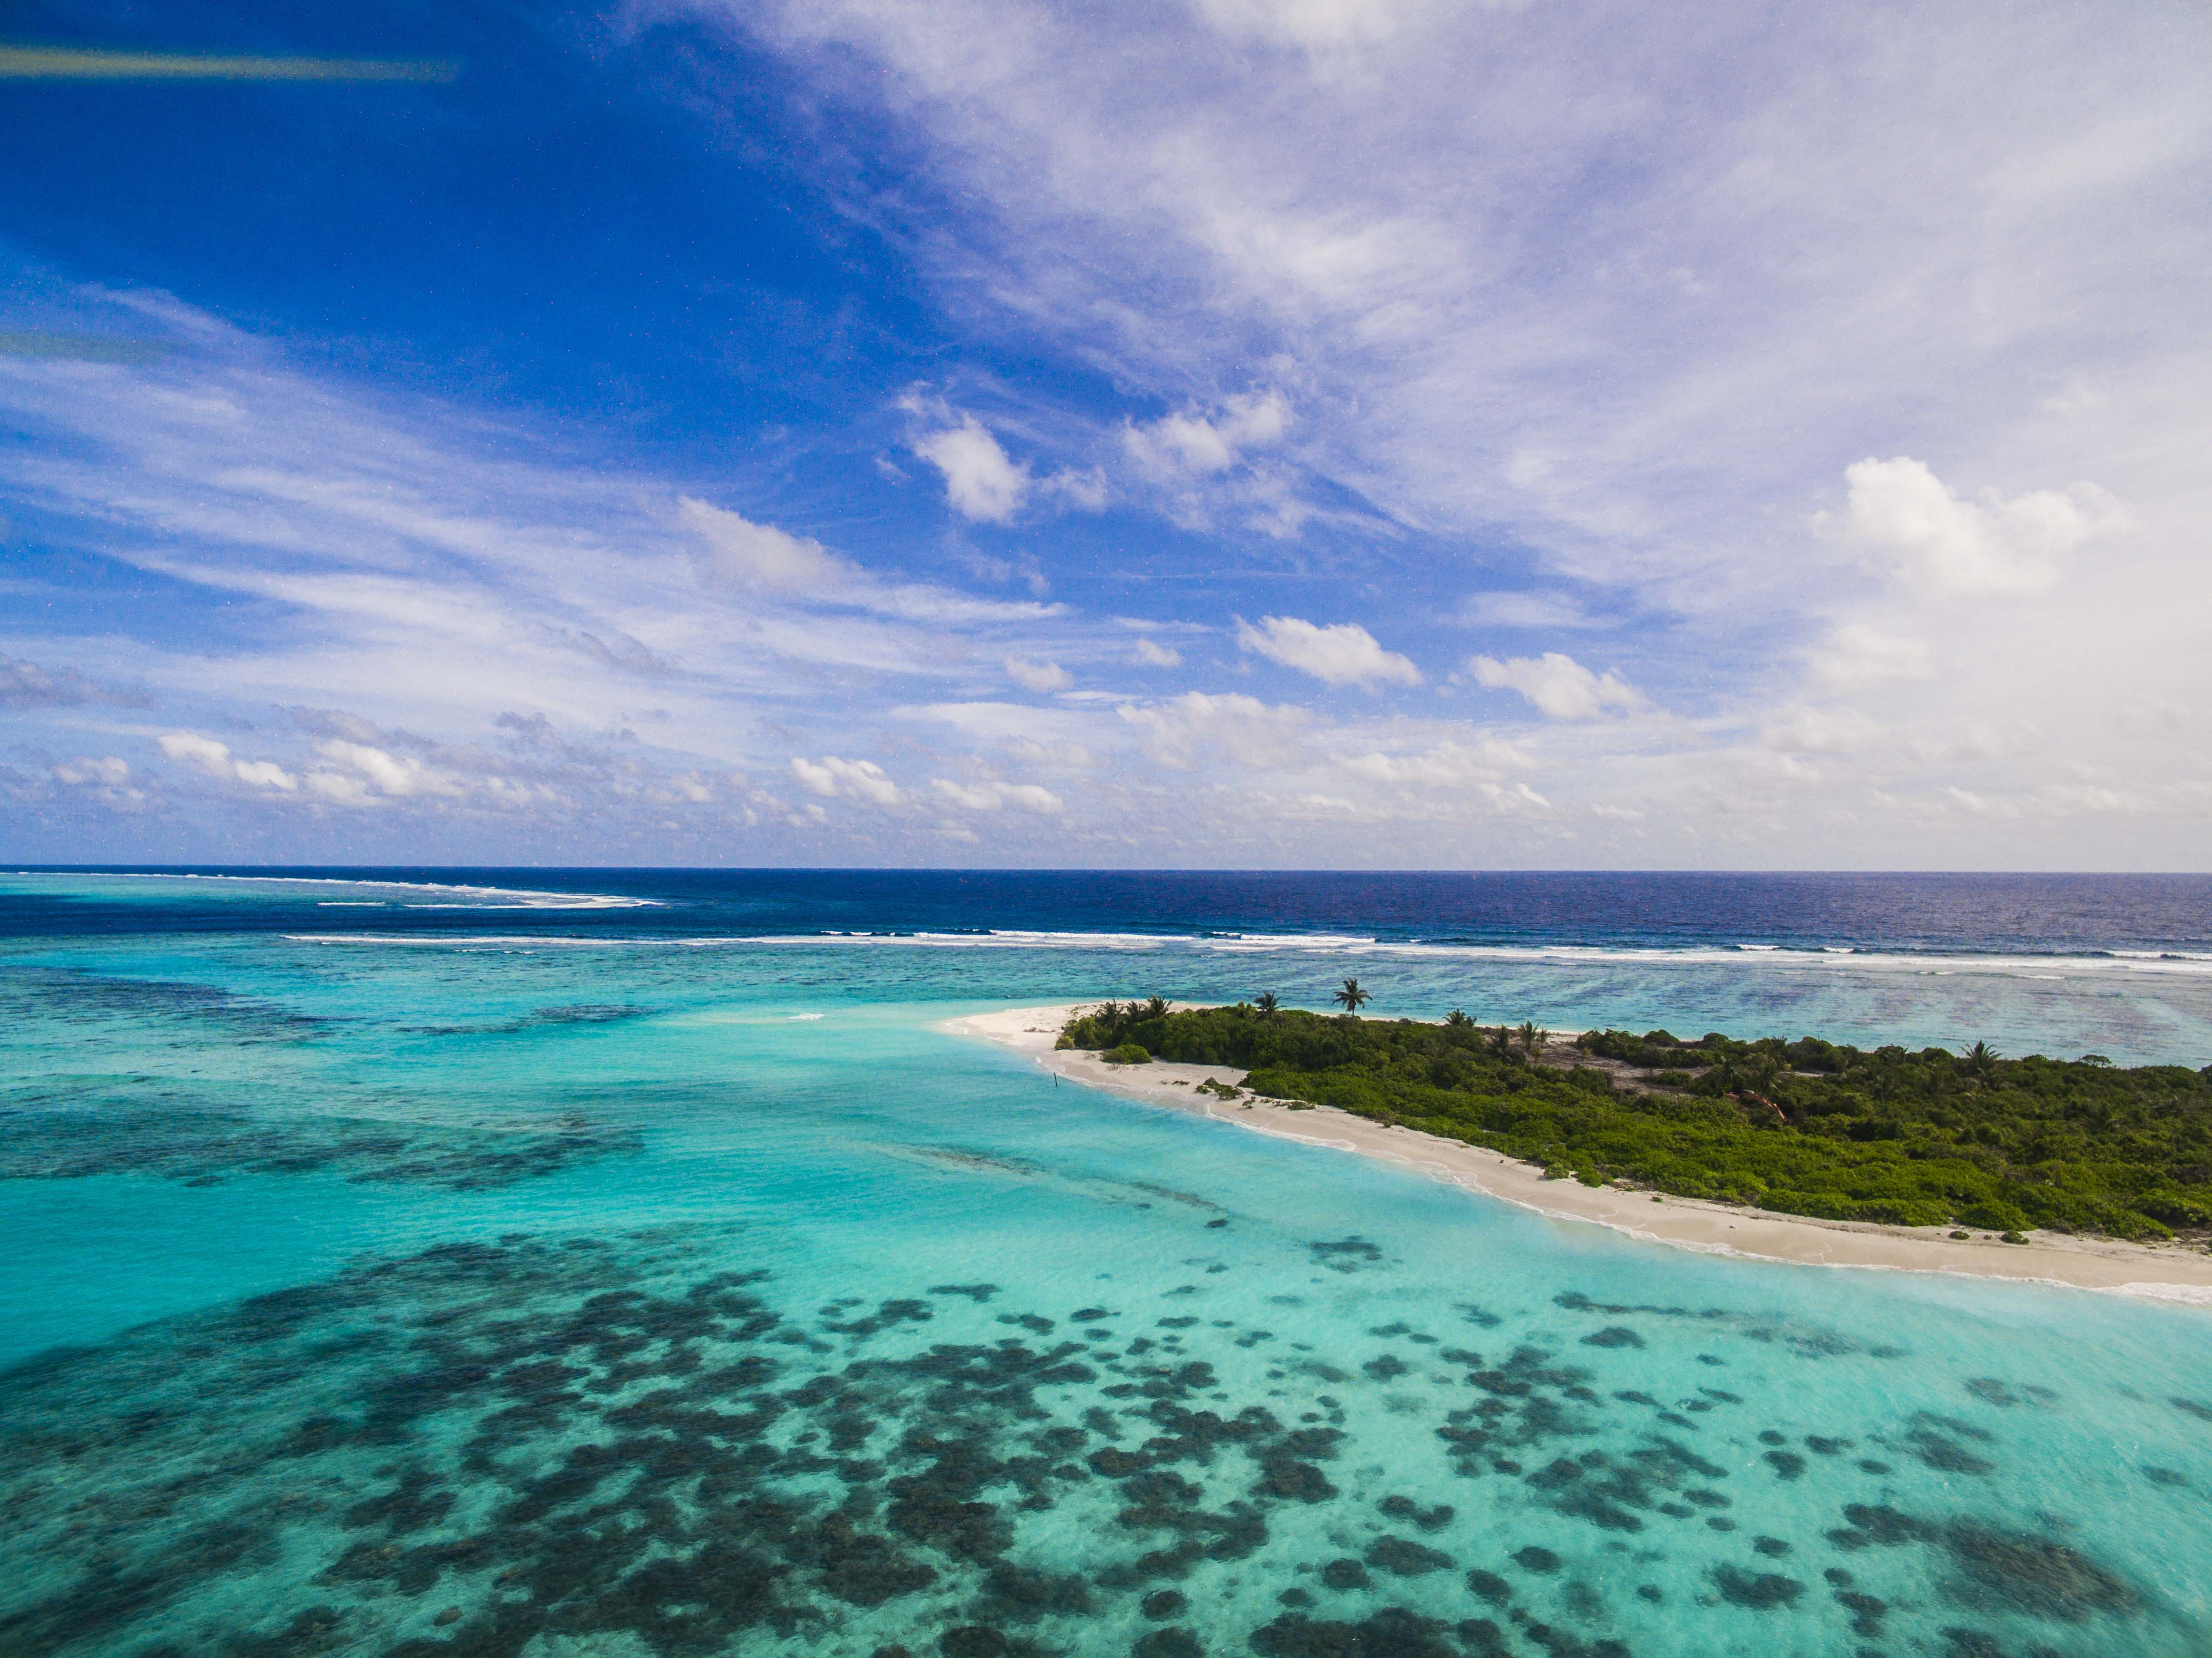 Lacabana Maldives  A Dh Maamigili Island (20)